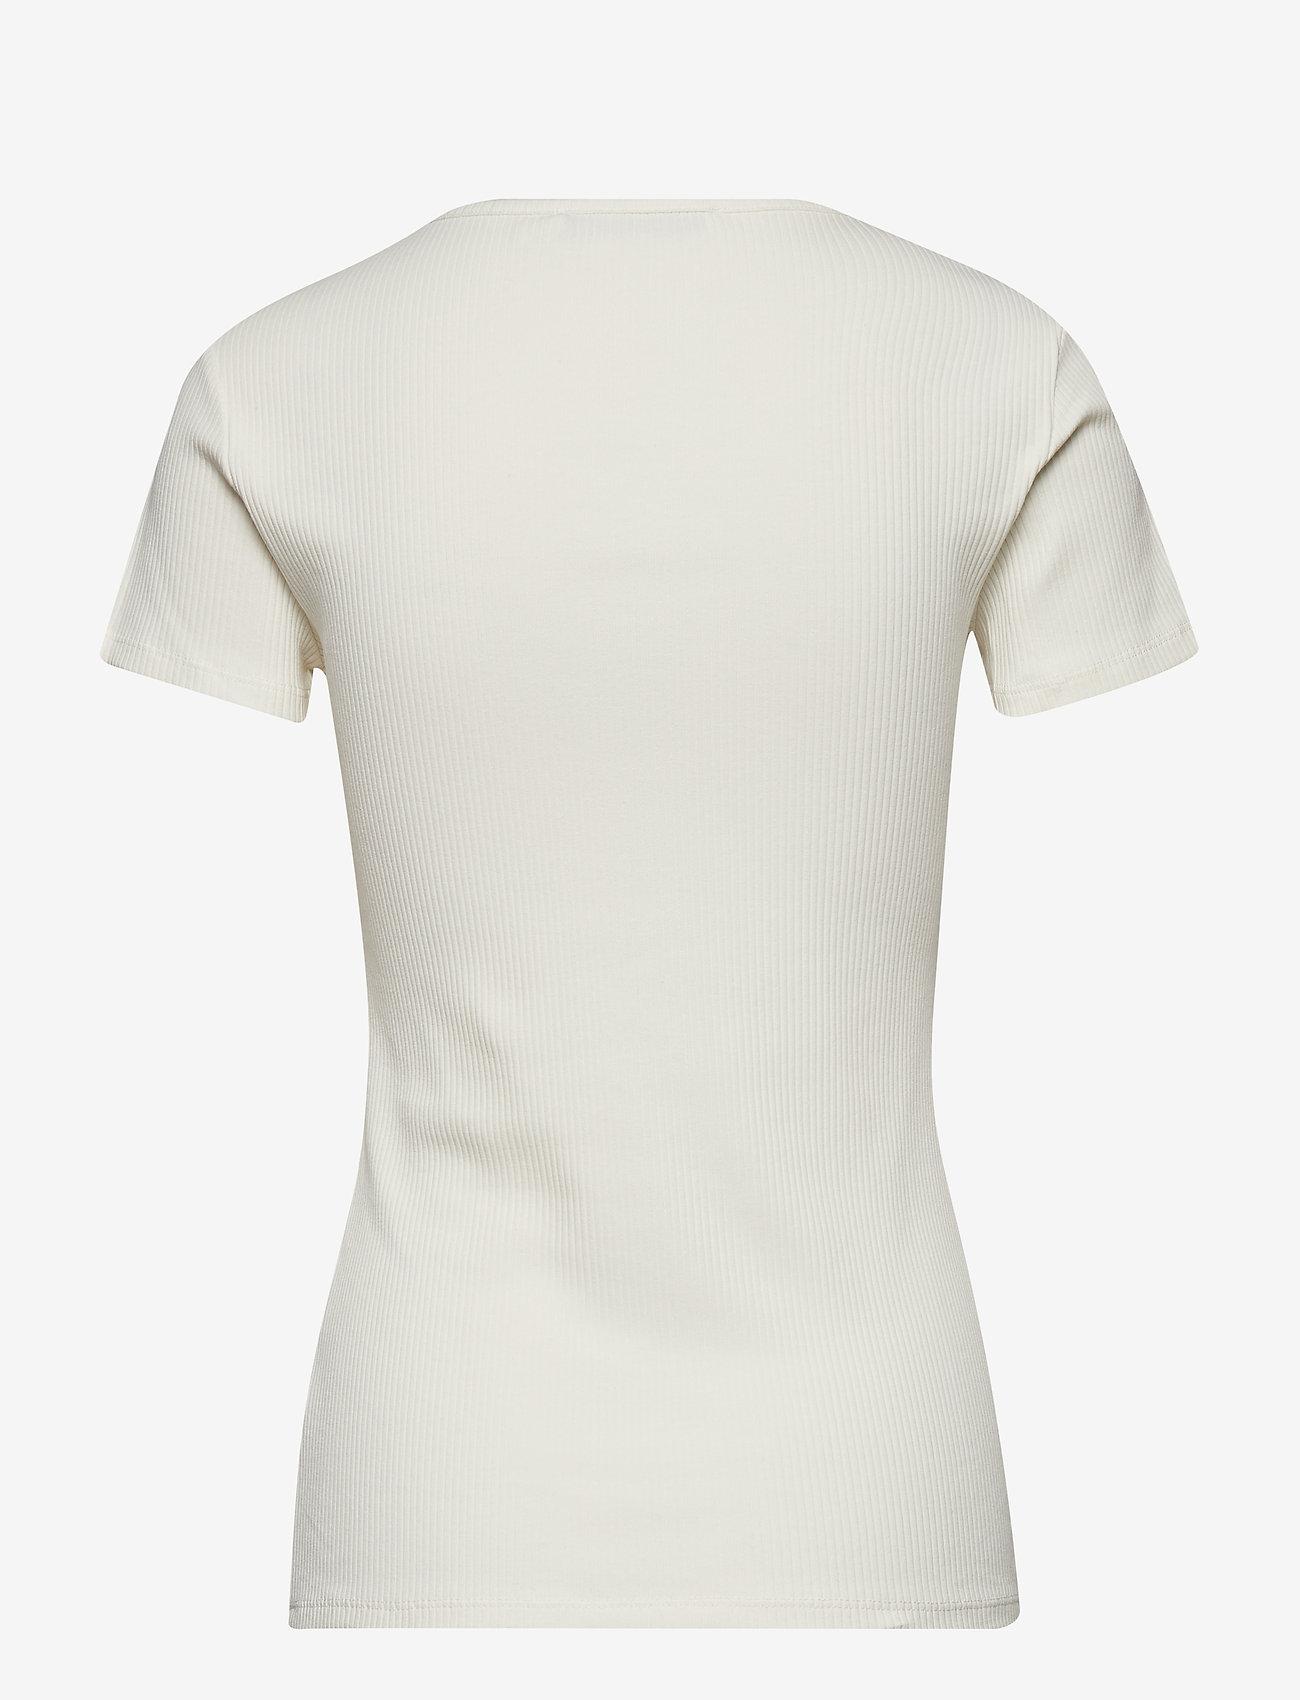 Gestuz - RollaGZ tee NOOS - basic t-shirts - bright white - 1